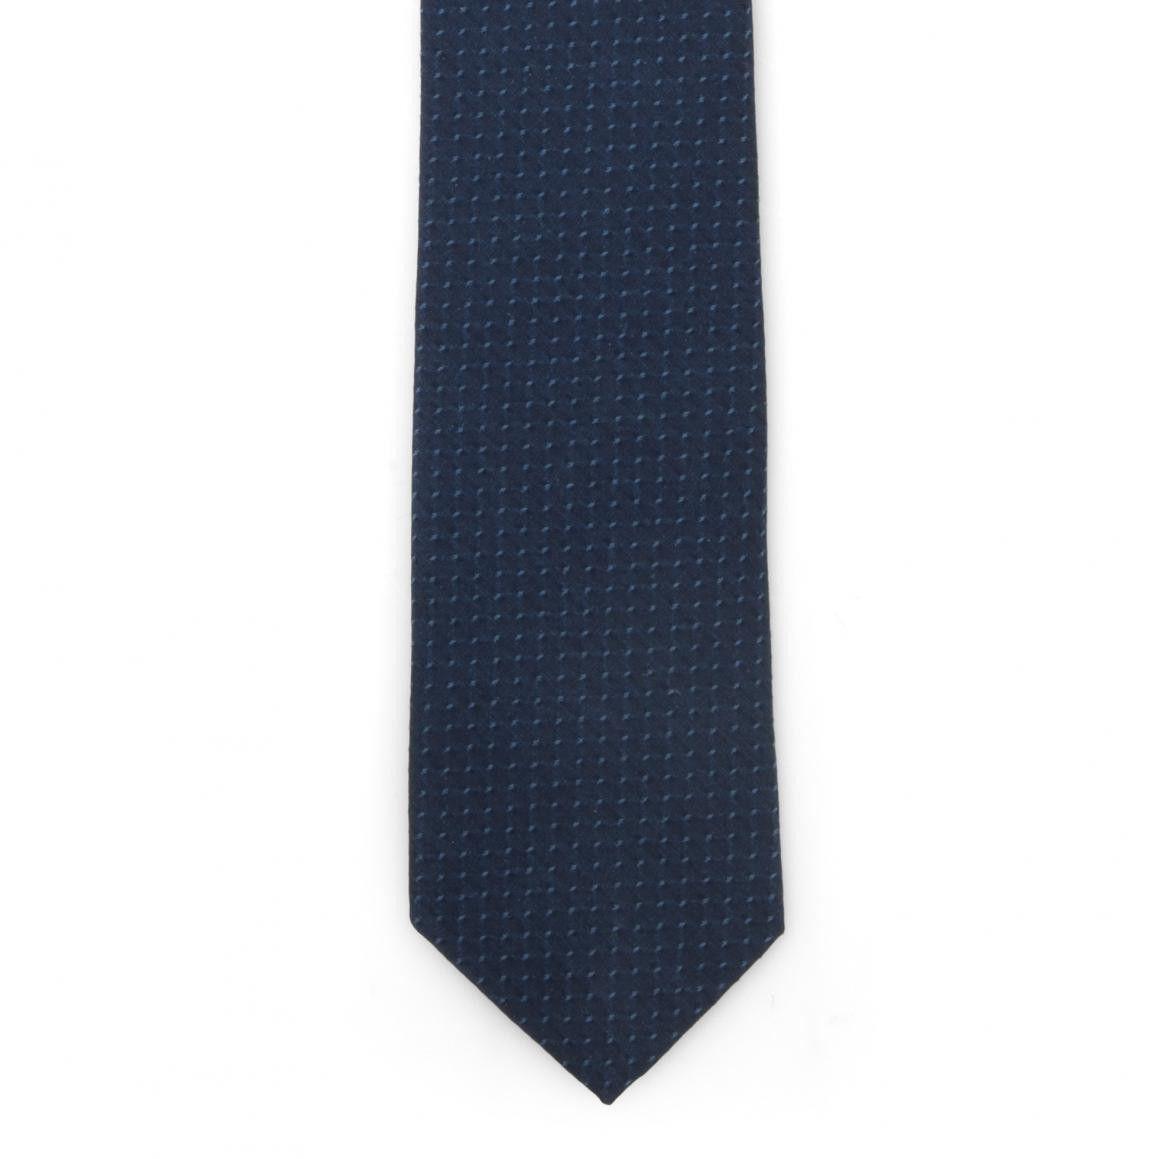 SIEGER - Herren Krawatte - Denim Fine Dots MAW - Deep Blue